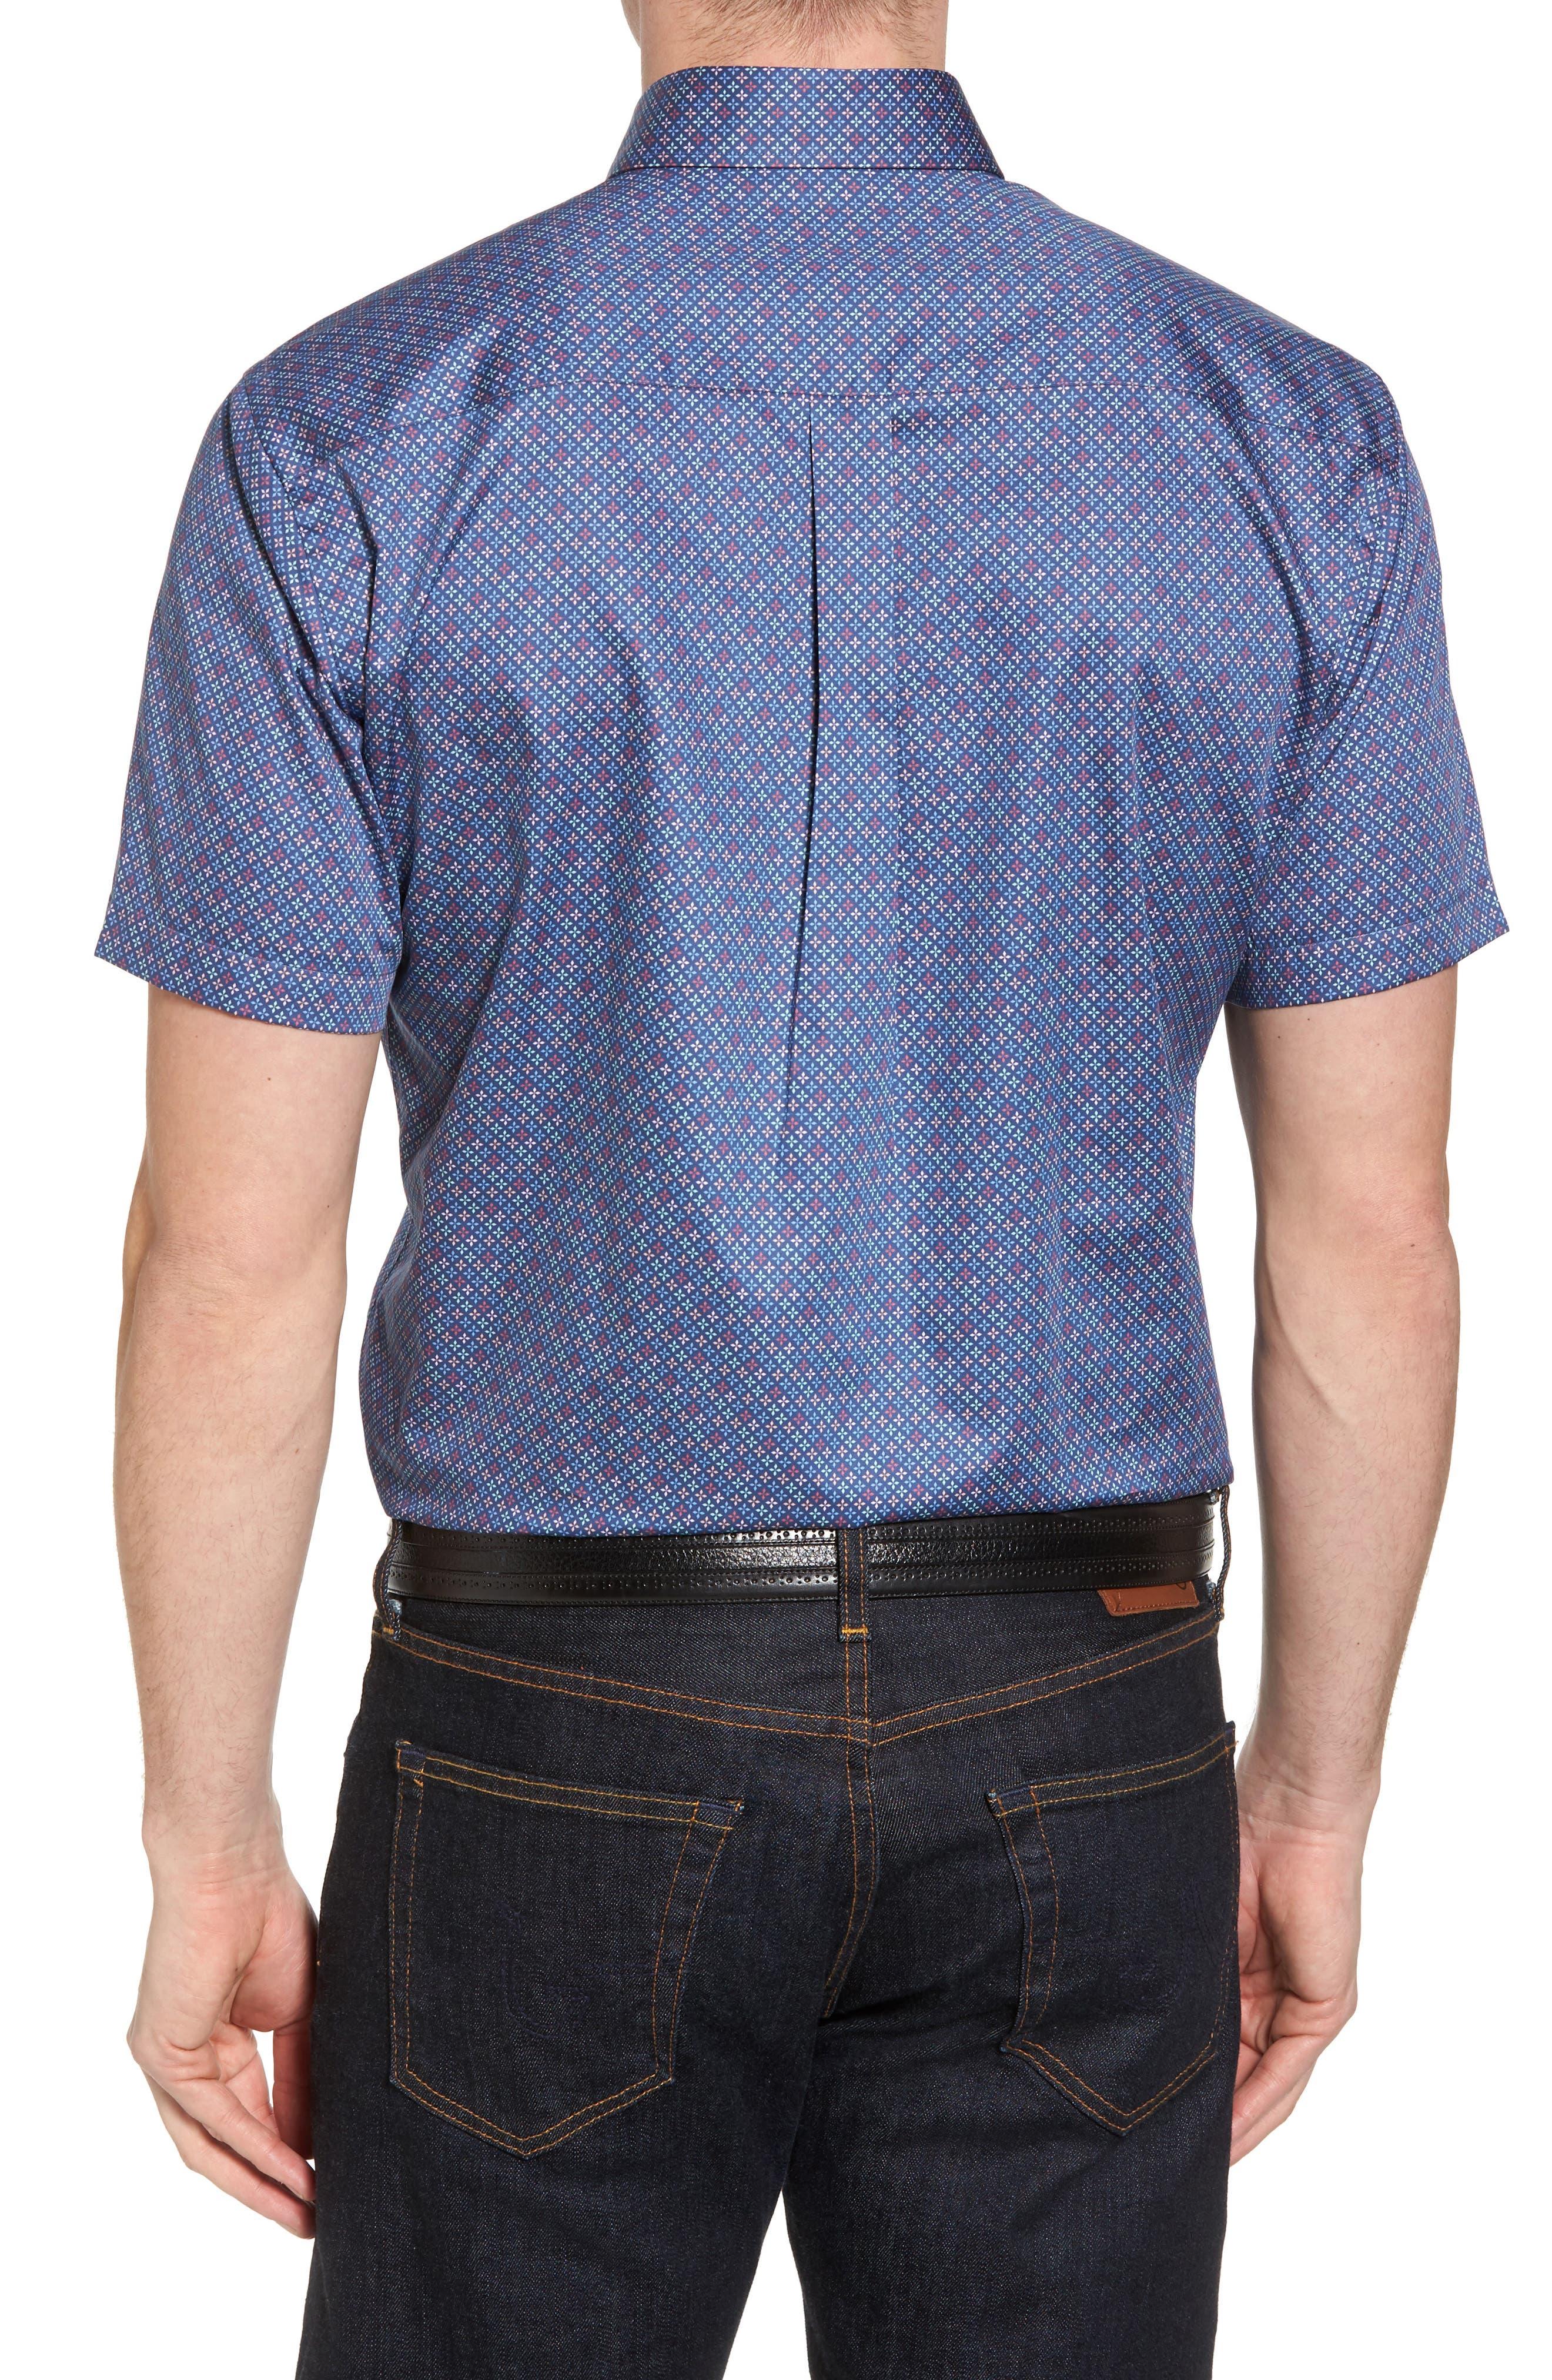 All Aces Regular Fit Sport Shirt,                             Alternate thumbnail 2, color,                             YANKEE BLUE